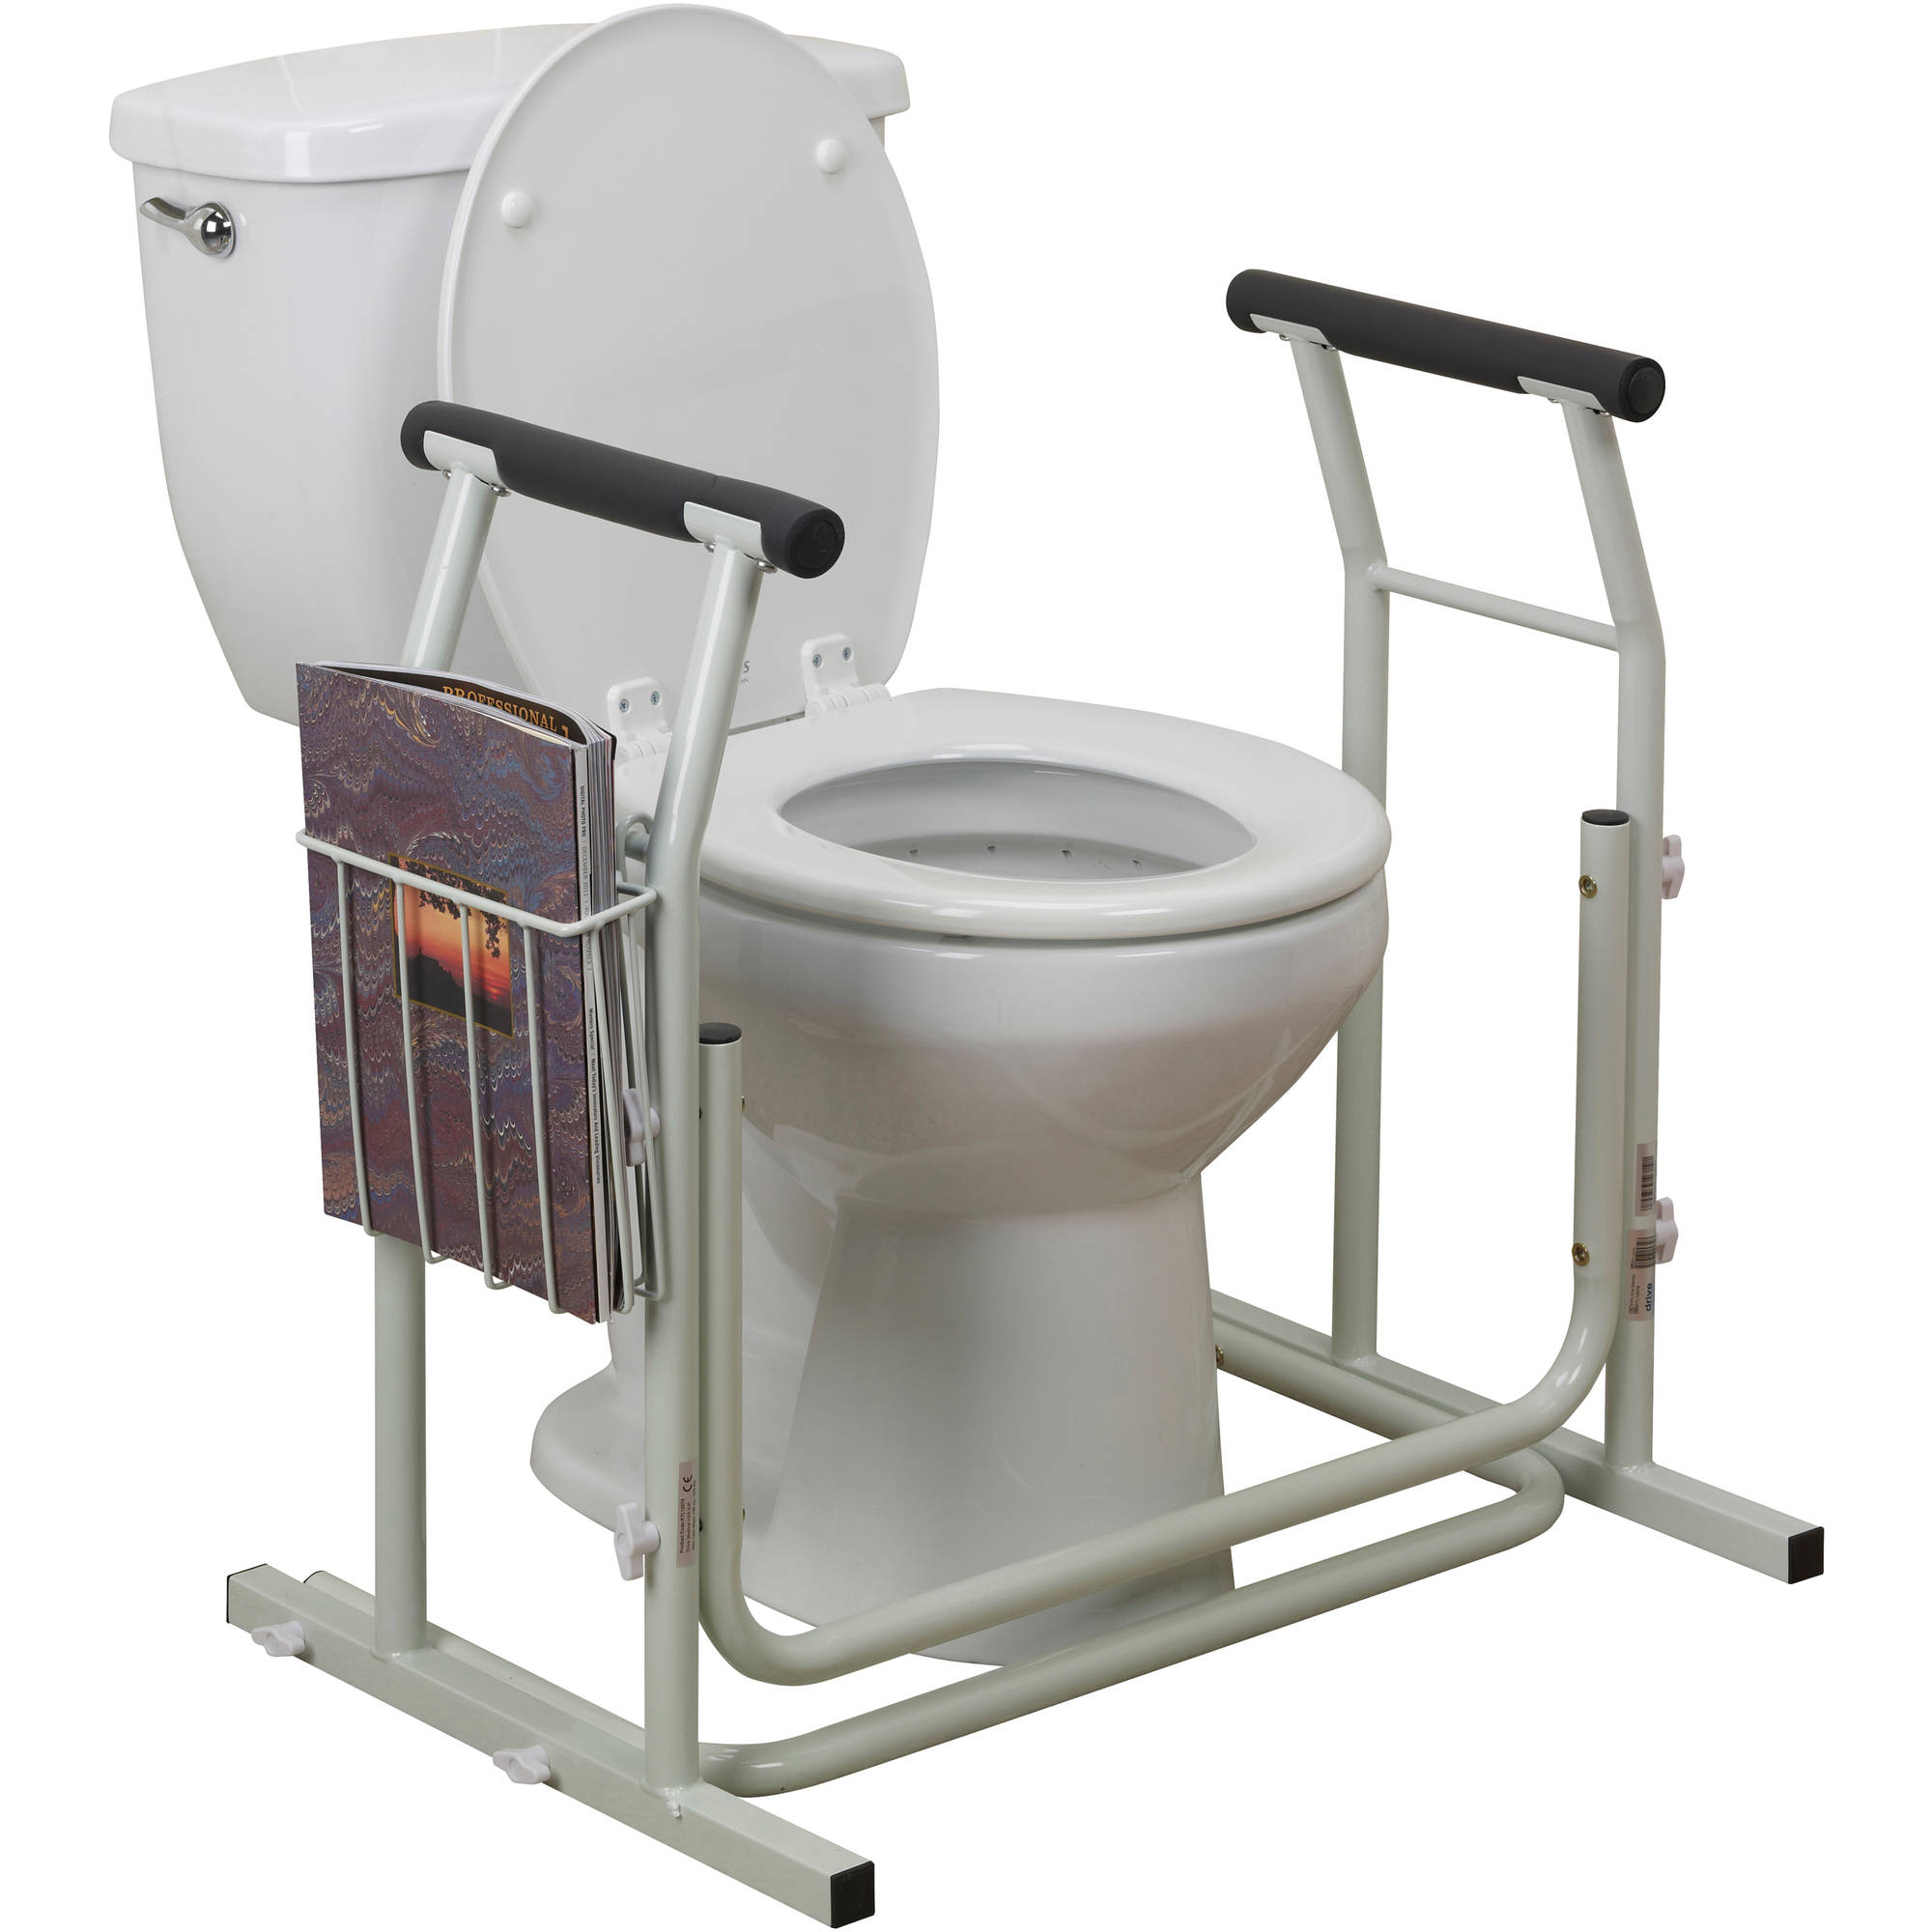 Shower Grab Bars For Elderly Photo Bath Grab Bars Luxury Curved. Amazoncom Moen 8732 Home 32 Inch Bathroom Grab Bar Stainless